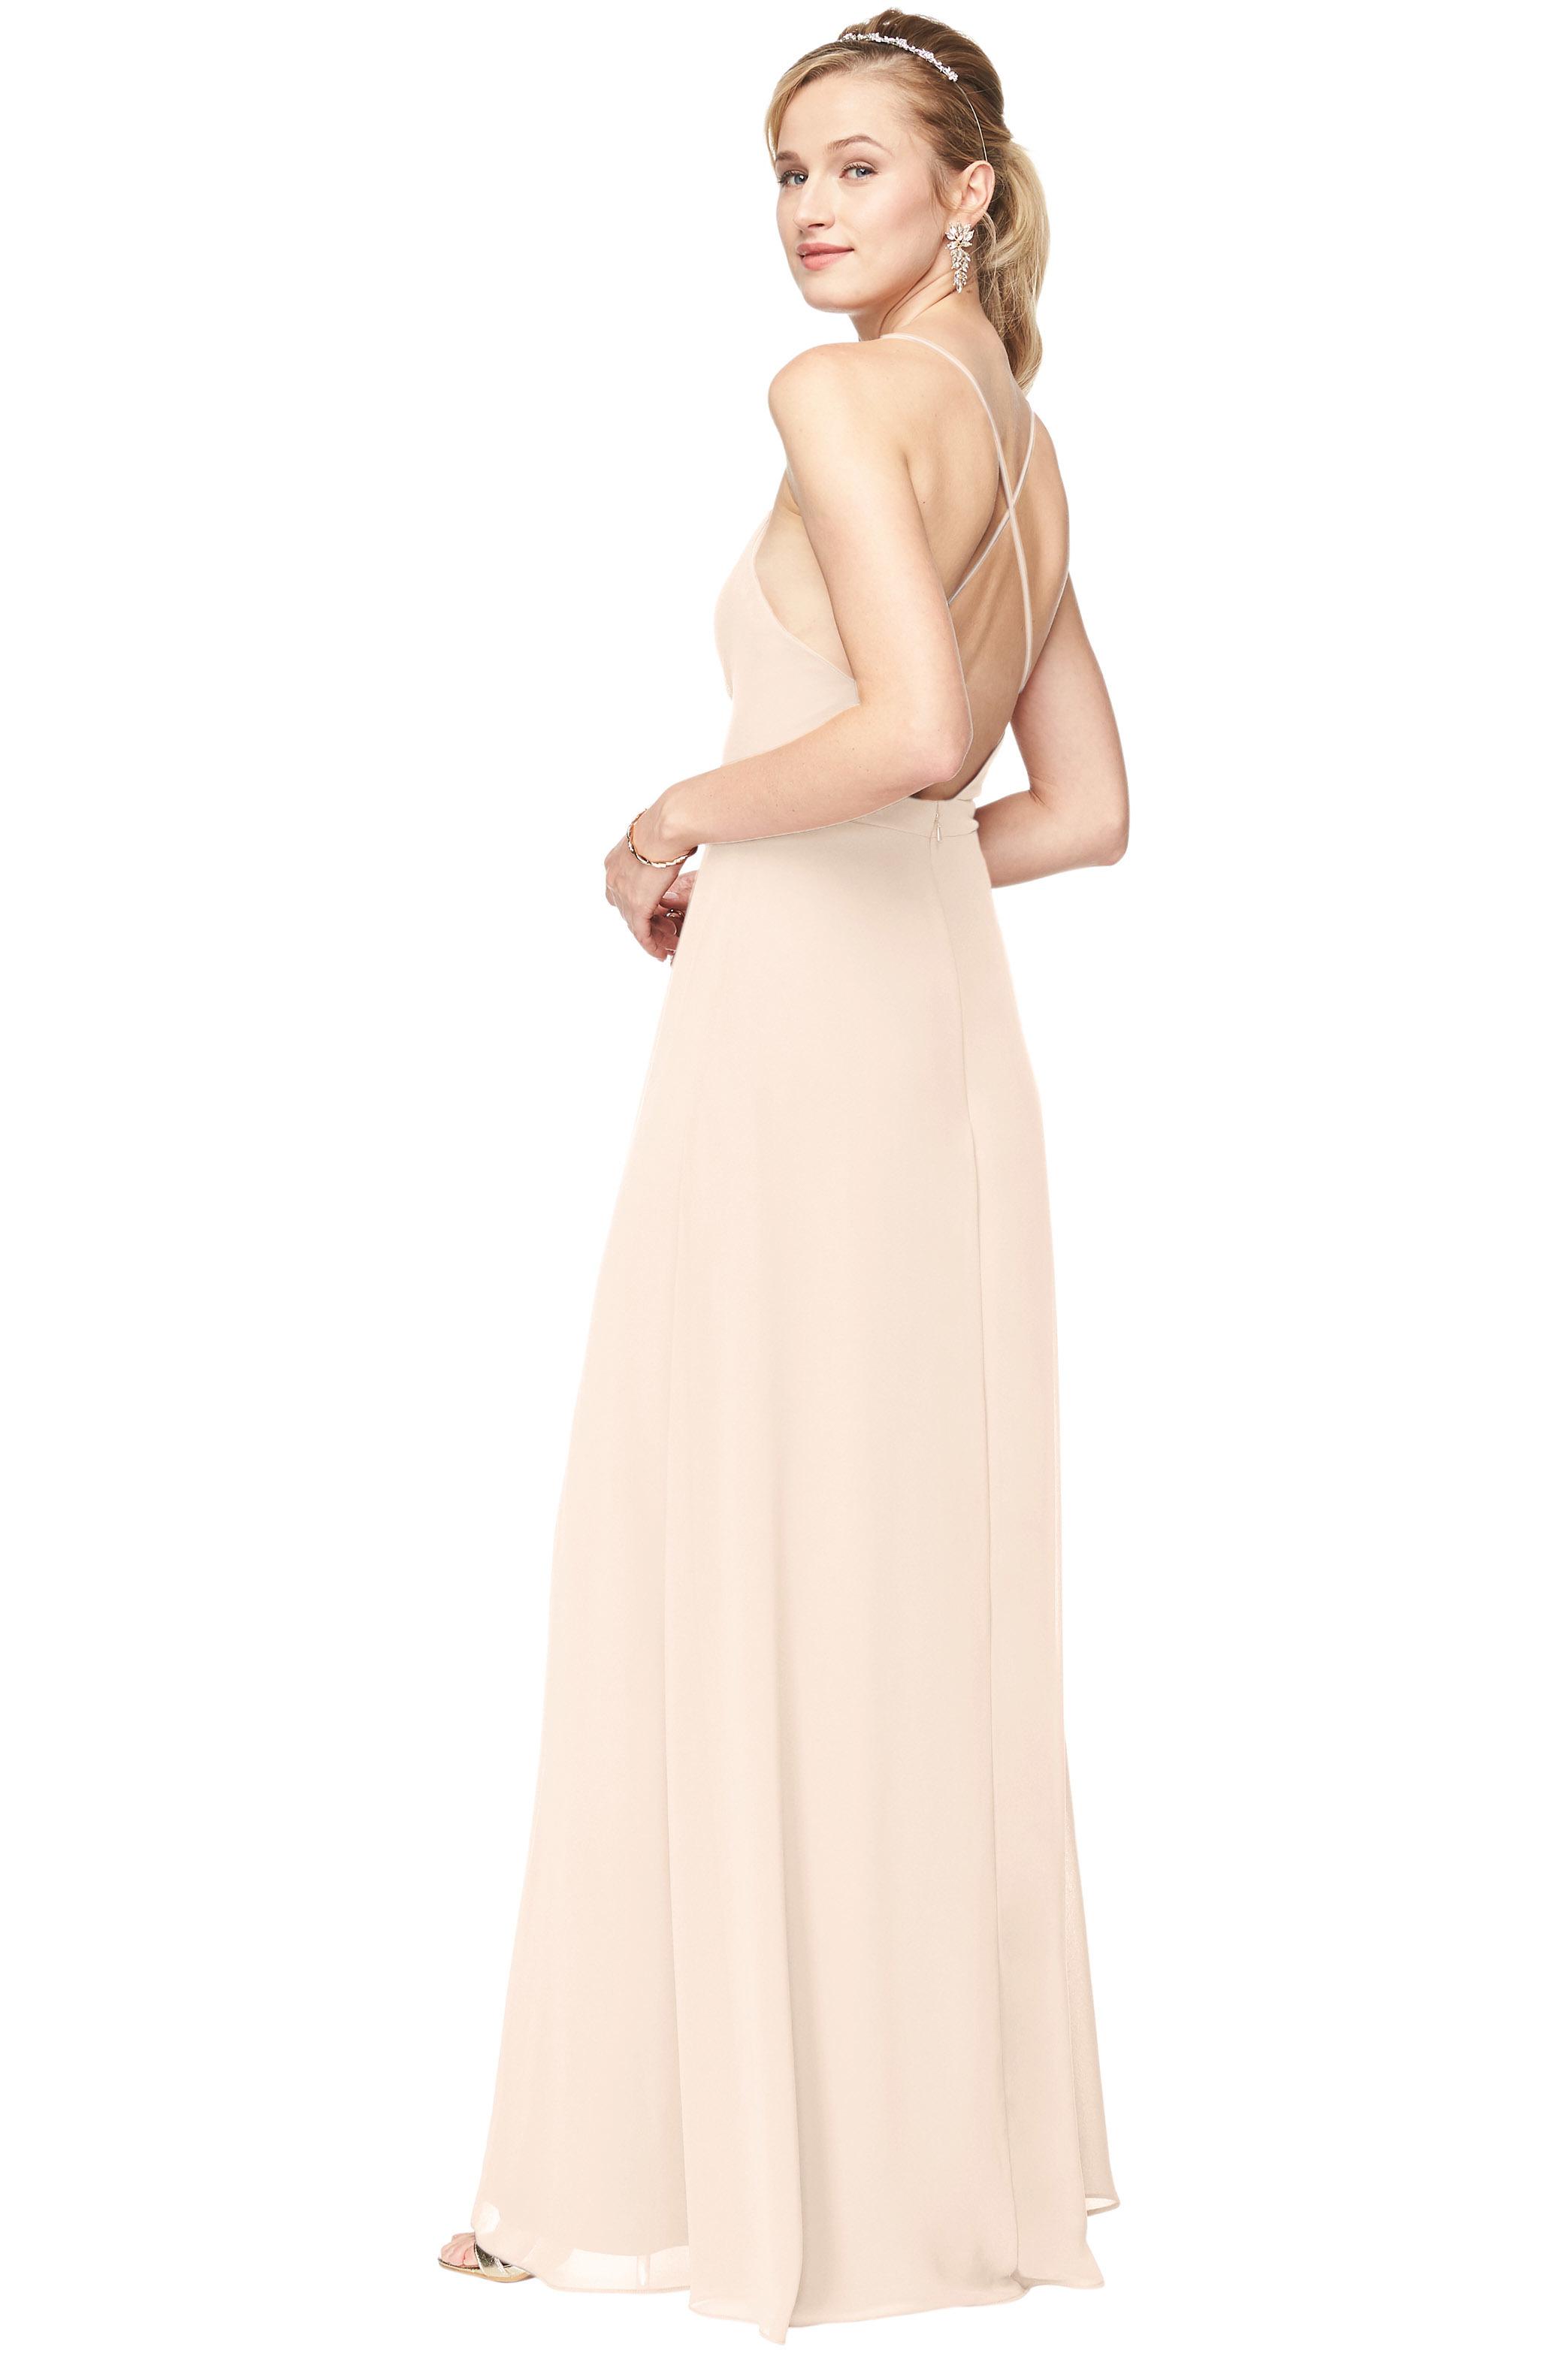 Bill Levkoff IVORY Chiffon Surplice A-Line gown, $178.00 Back